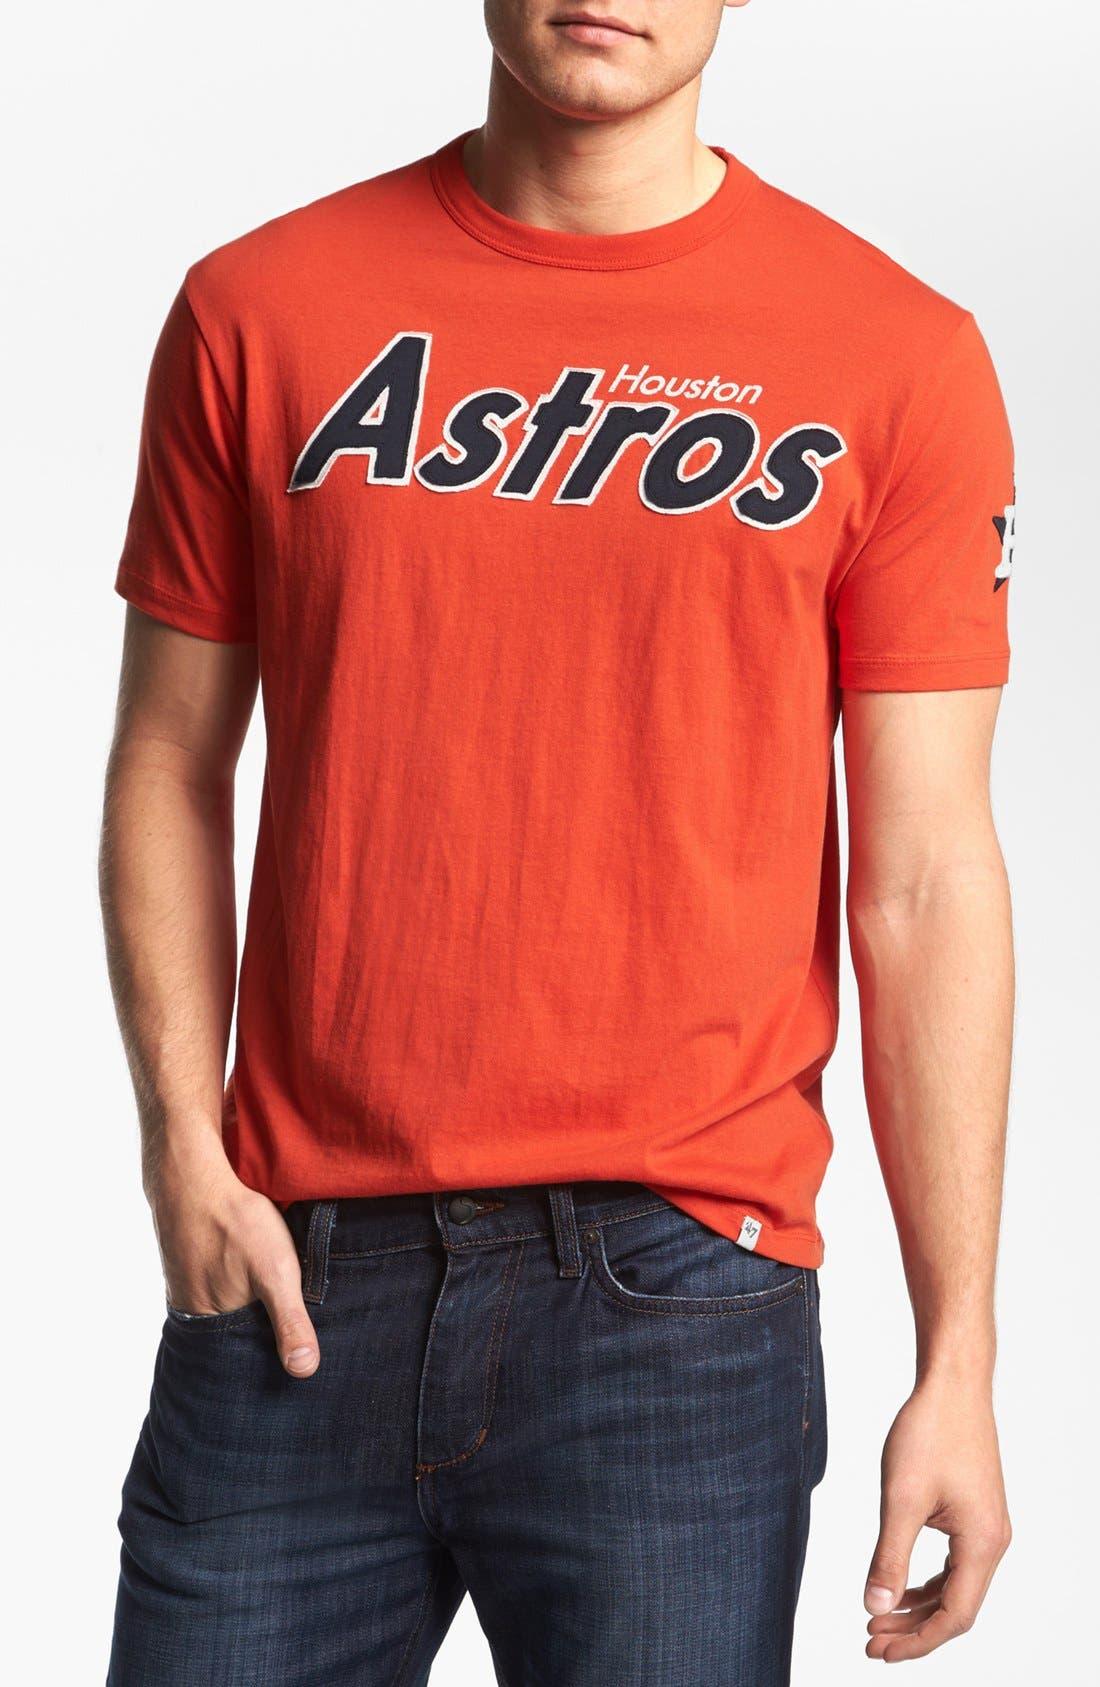 Main Image - 47 Brand 'Houston Astros - Fieldhouse' T-Shirt